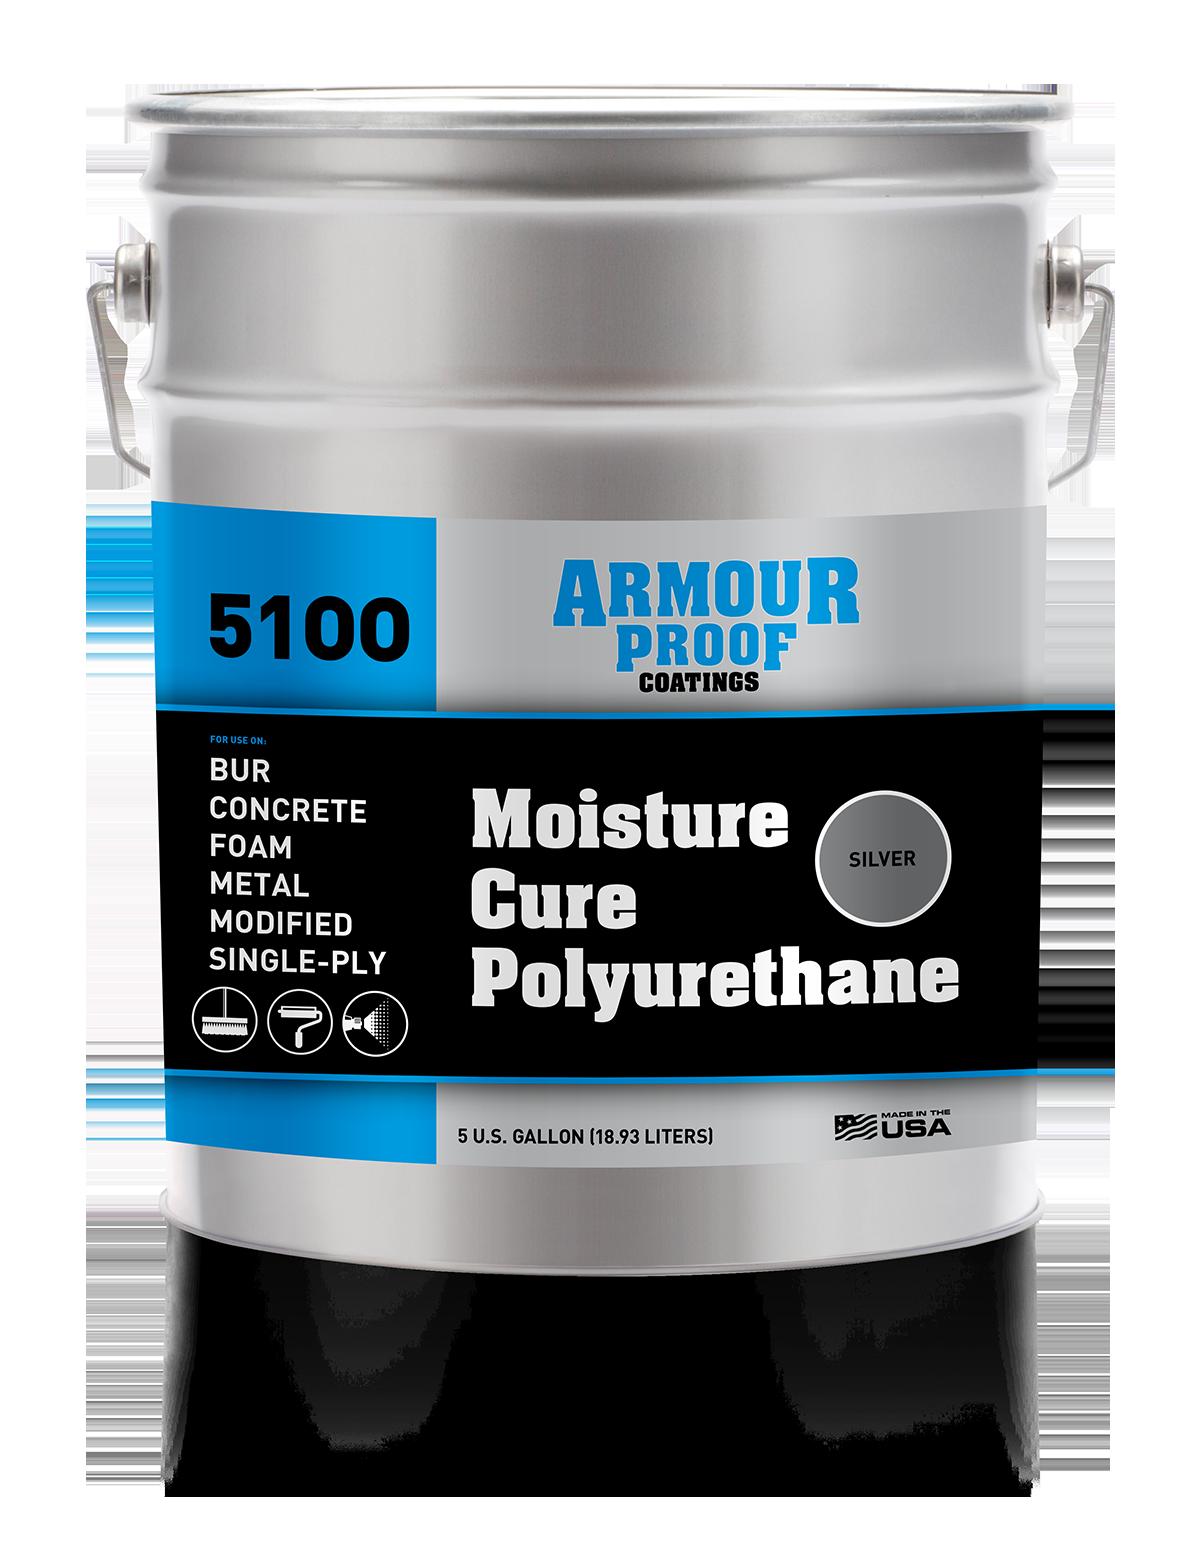 Image of AP-5100 Silver Moisture Cure Polyurethane - 5 Gallon Pail